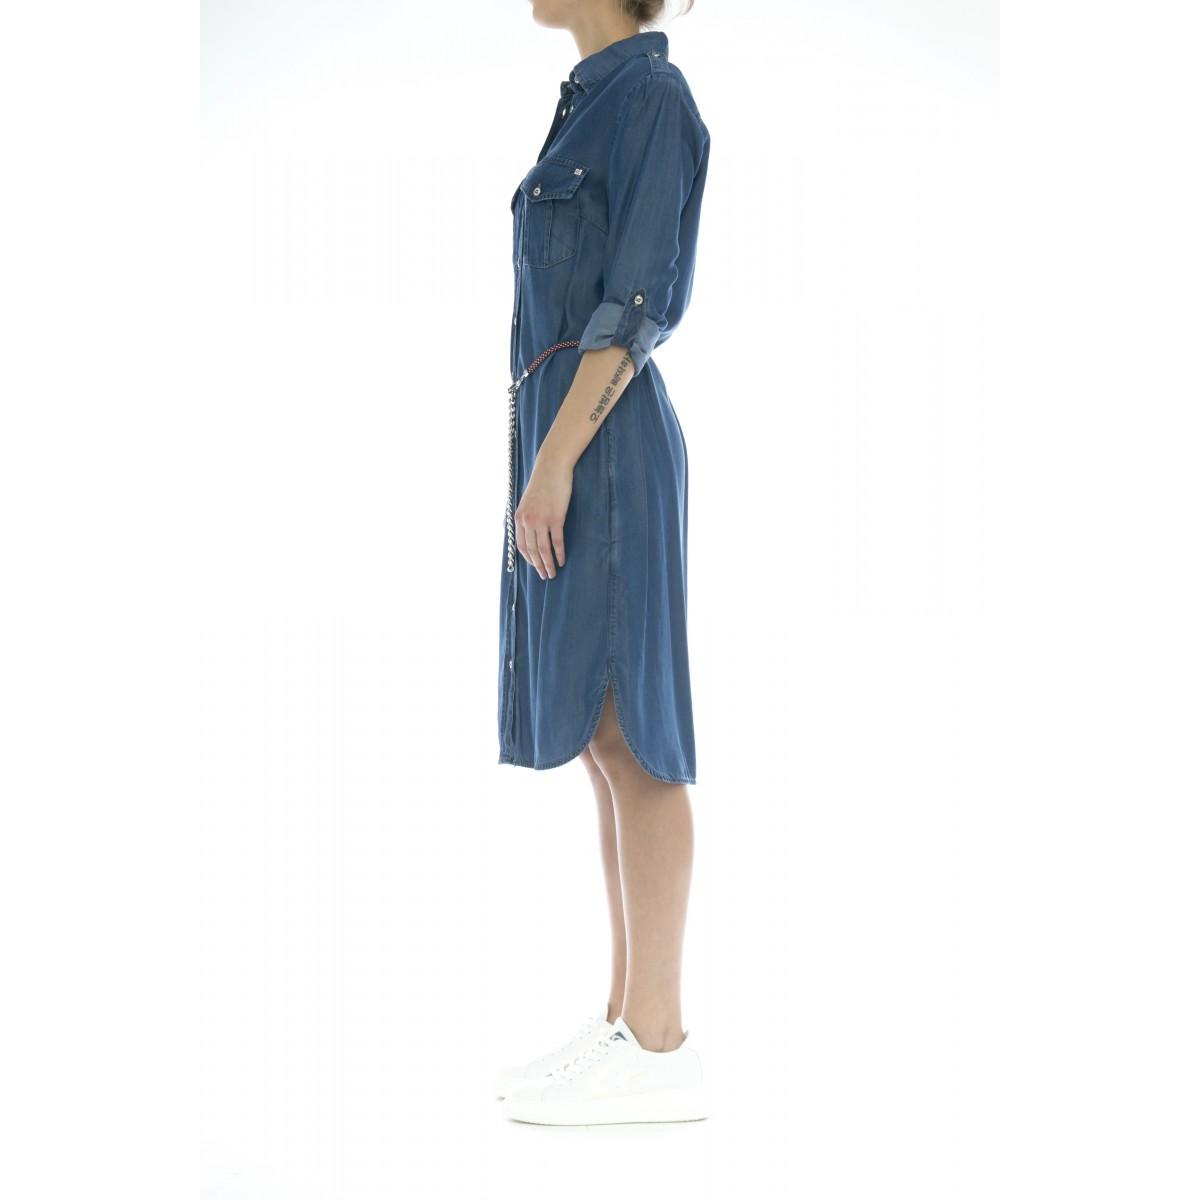 Vestito - Qudo vestito denim